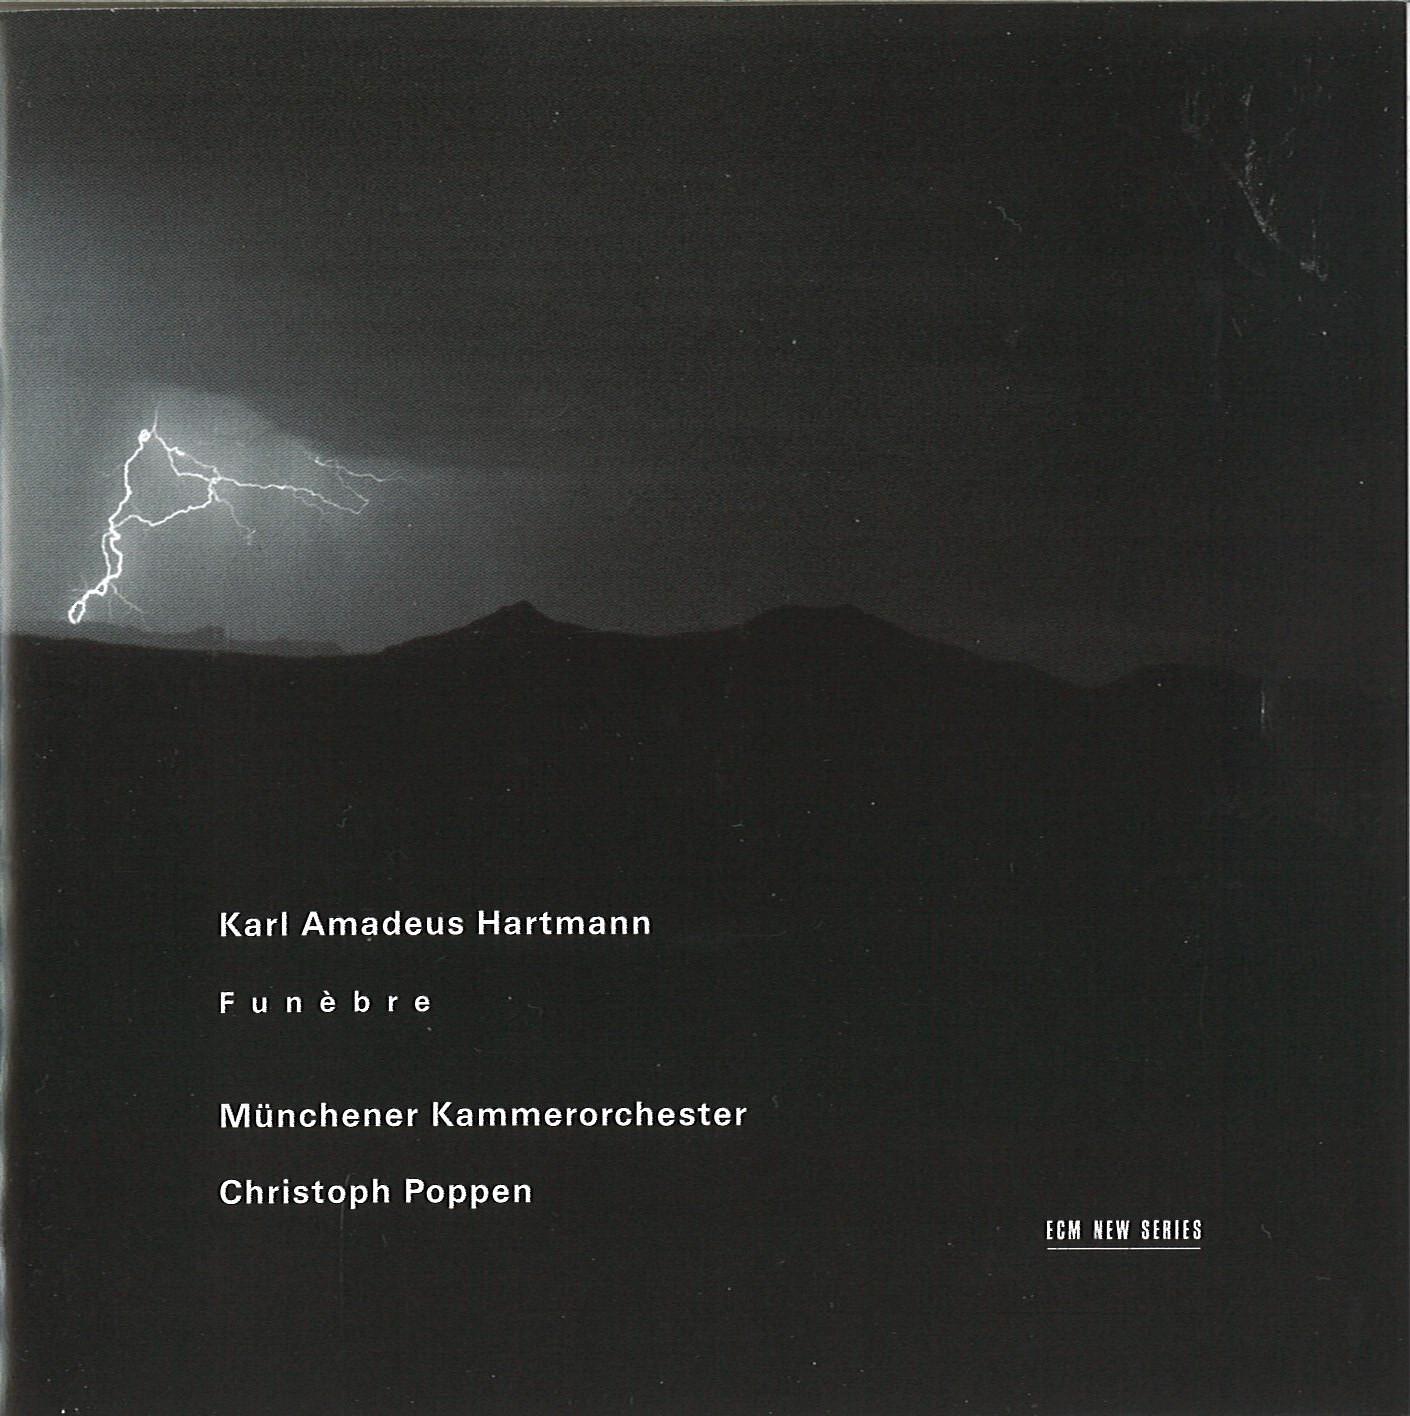 ECM Münchener Kammerorchester Karl Amadeus Hartmann Funèbre